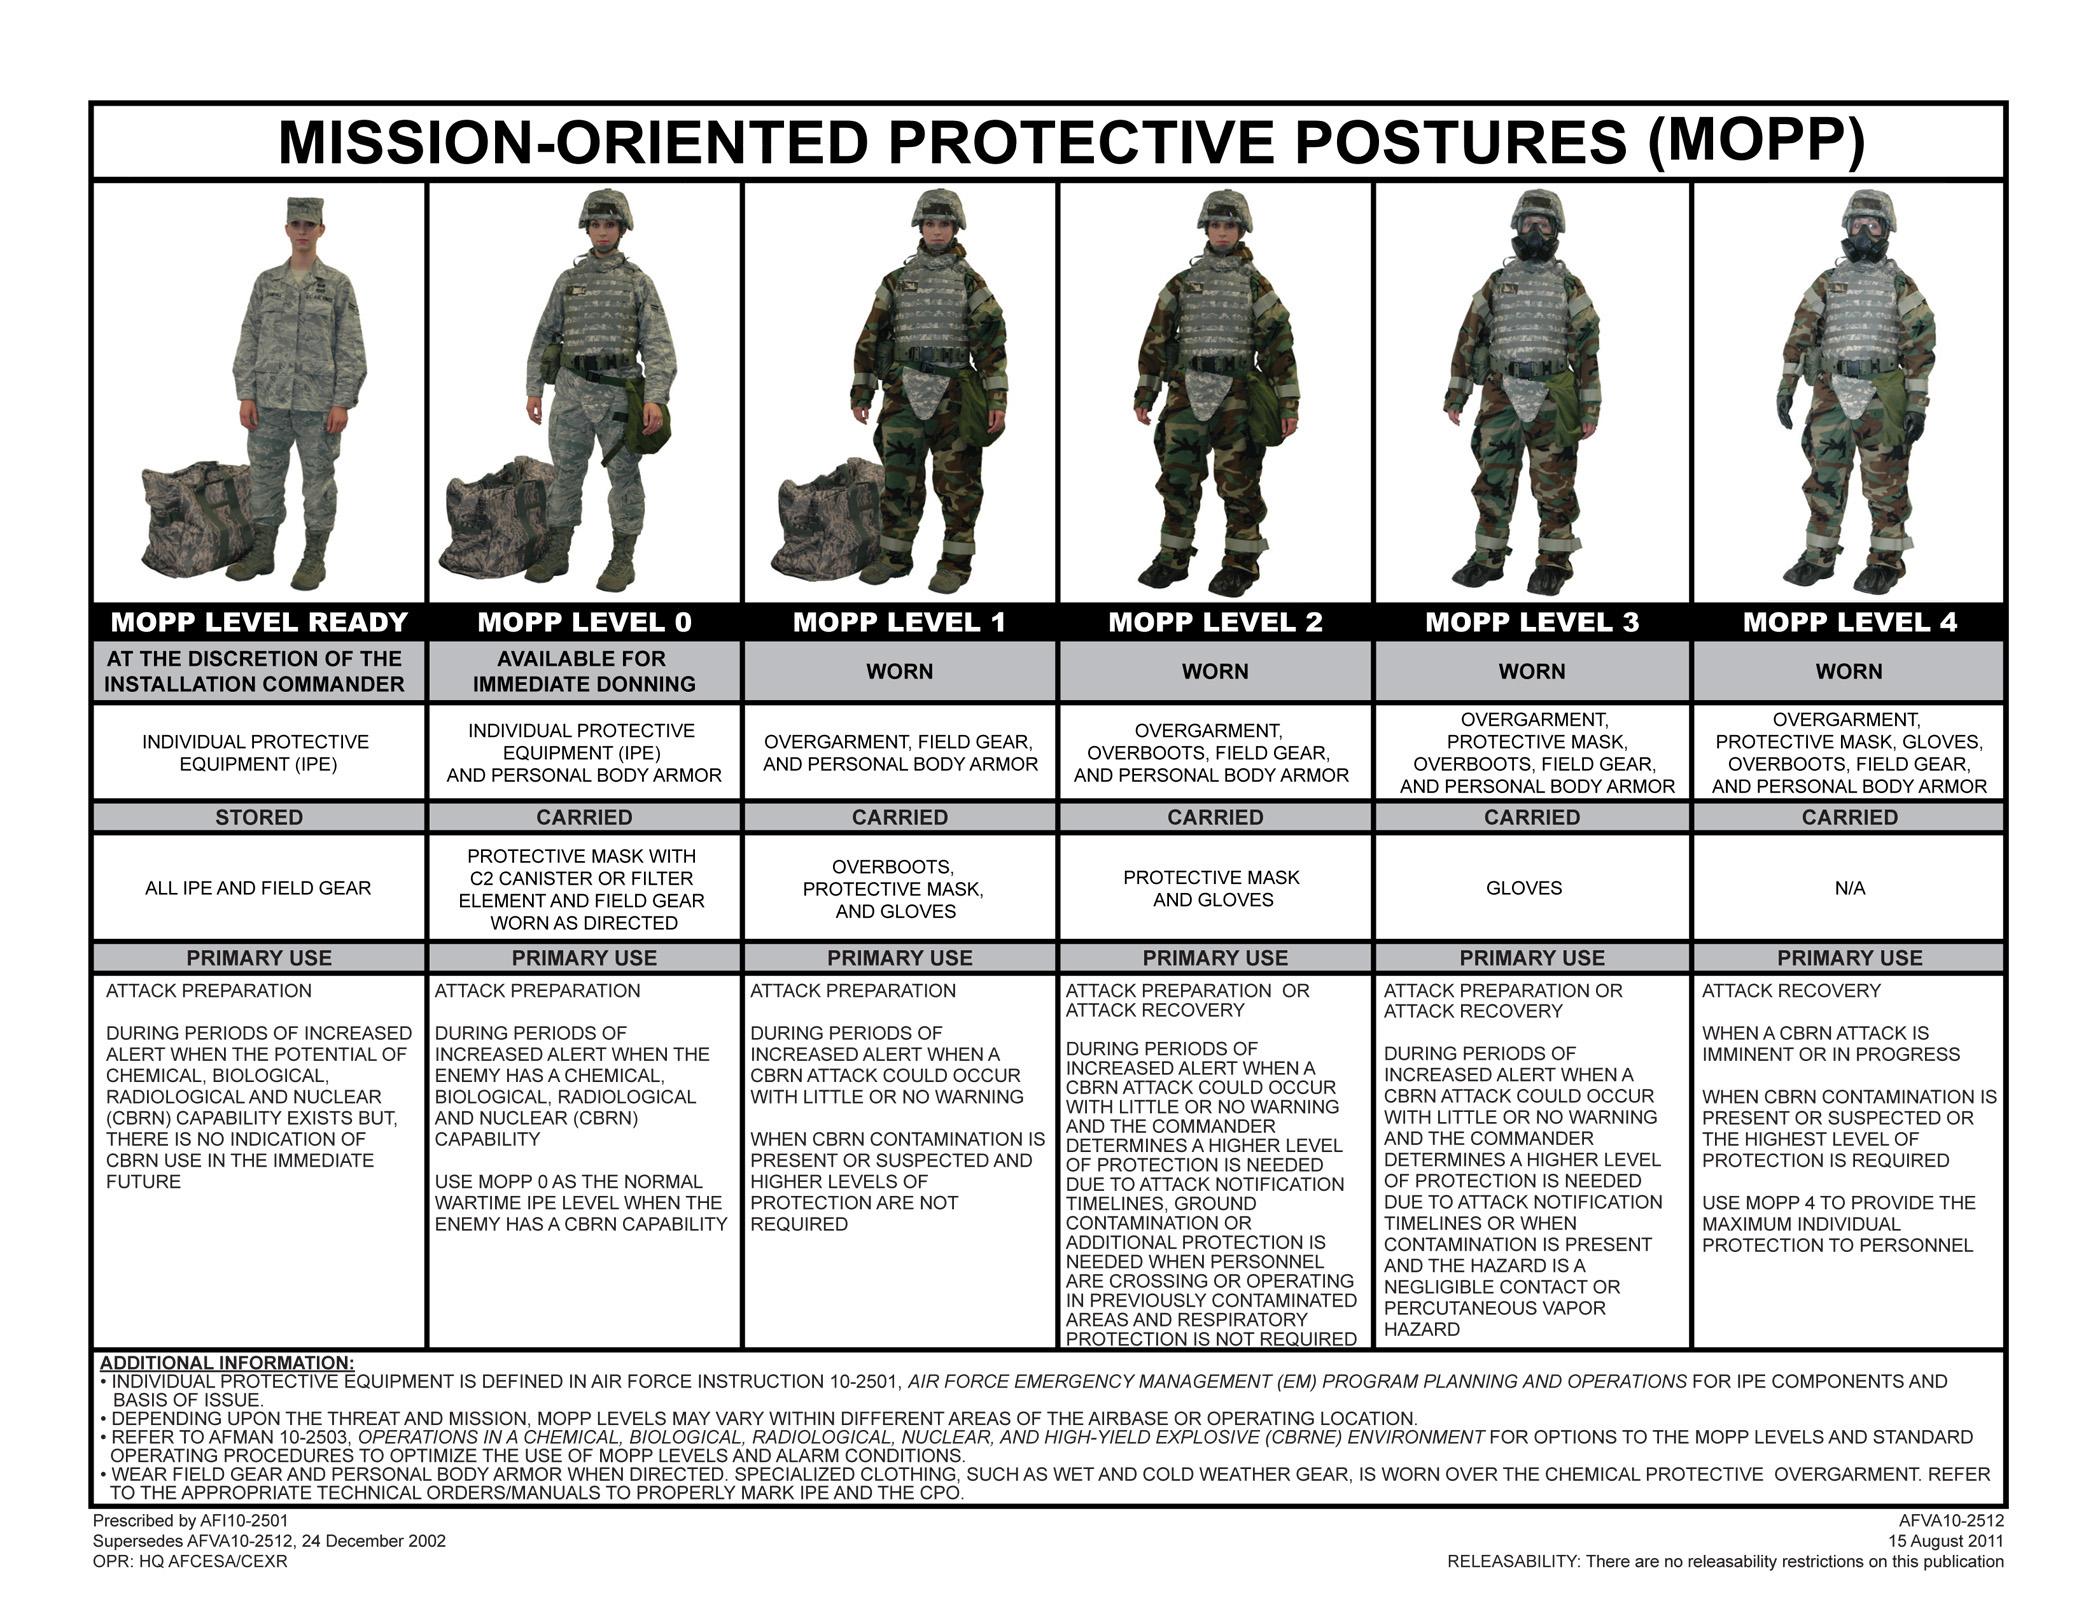 US Air Force MOPP Levels circa 2011. (Source: US Air Force, Public Domain)